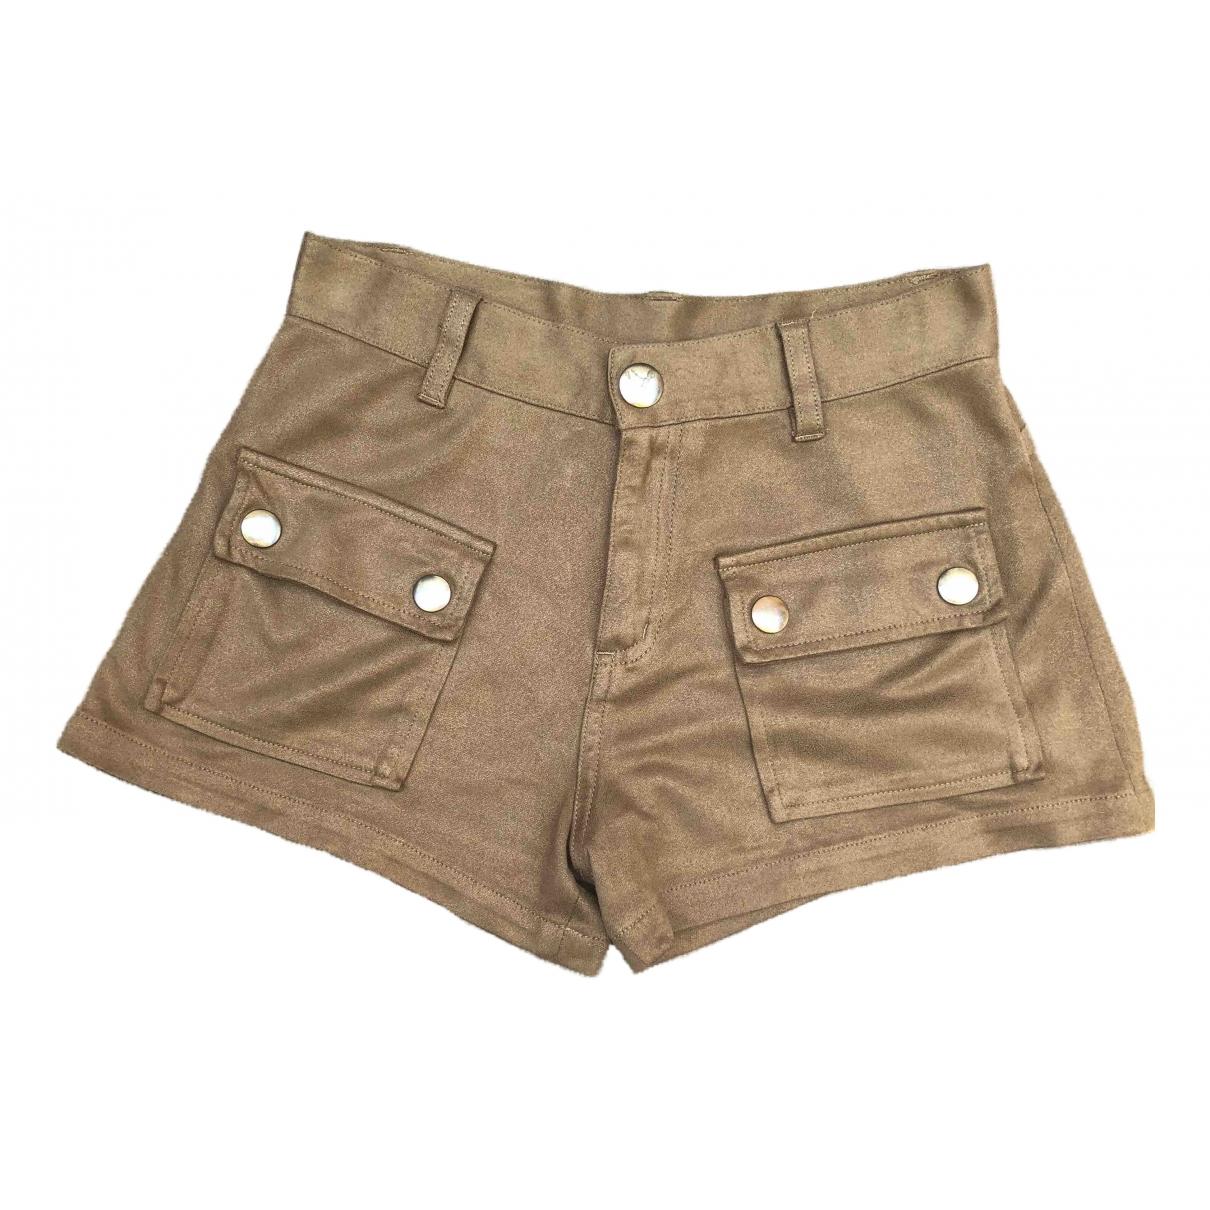 Sonia Rykiel \N Shorts in  Kamel Polyester